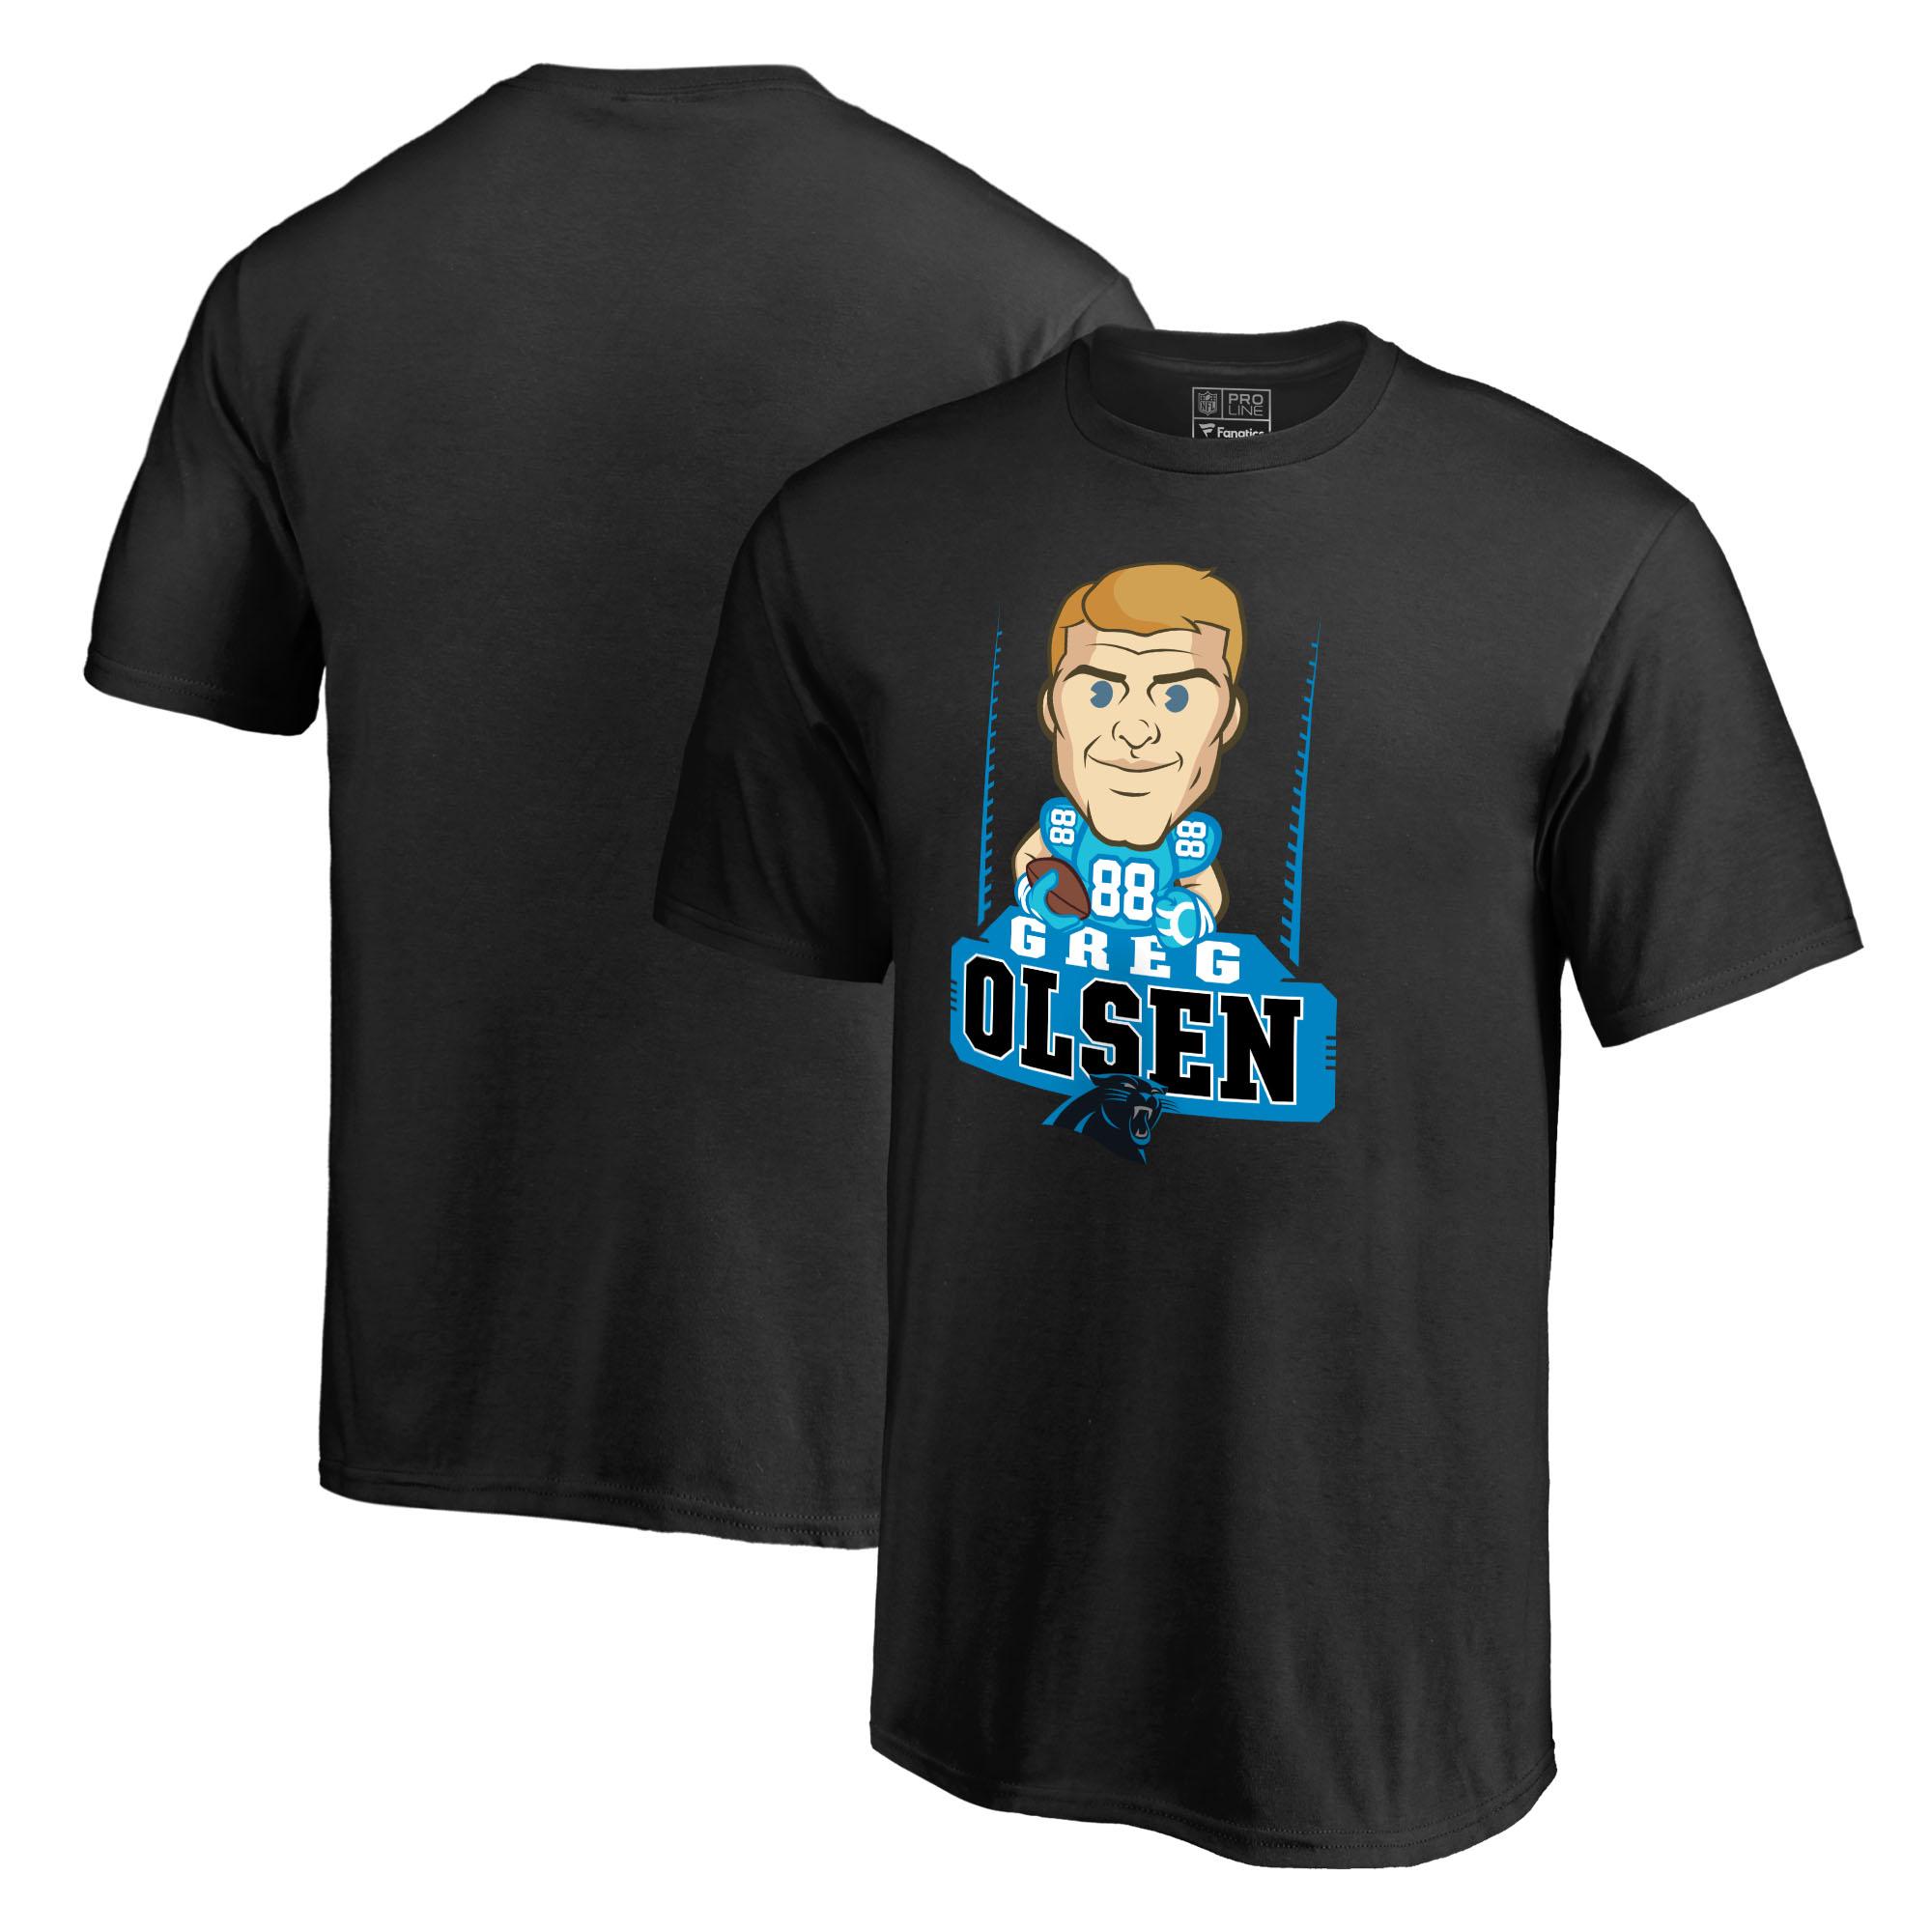 Greg Olsen Carolina Panthers NFL Pro Line Youth Emoji Player T-Shirt - Black